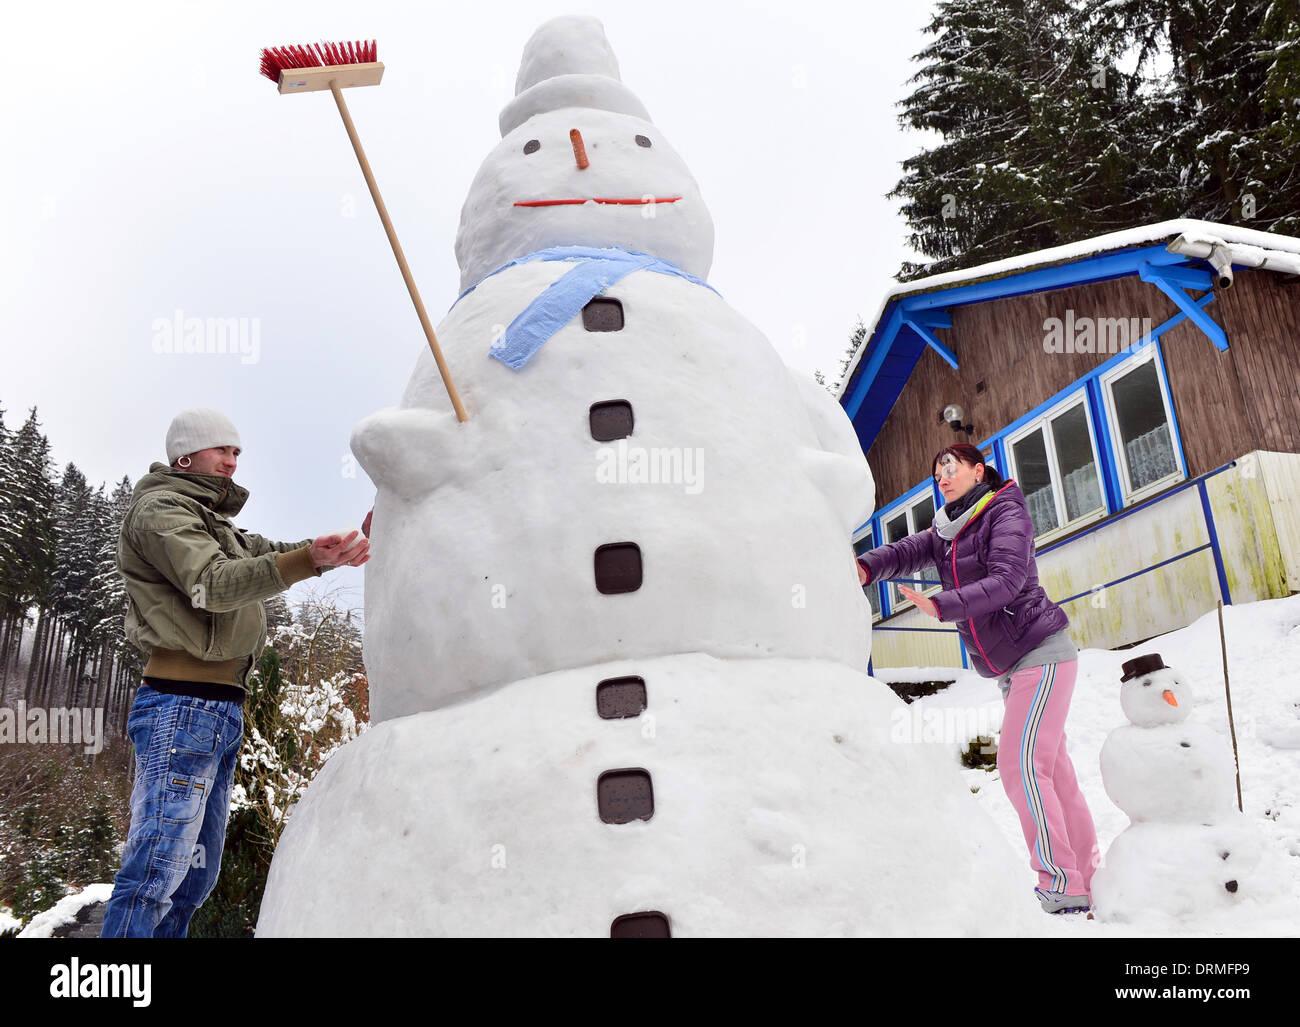 How to make a snow figure 69